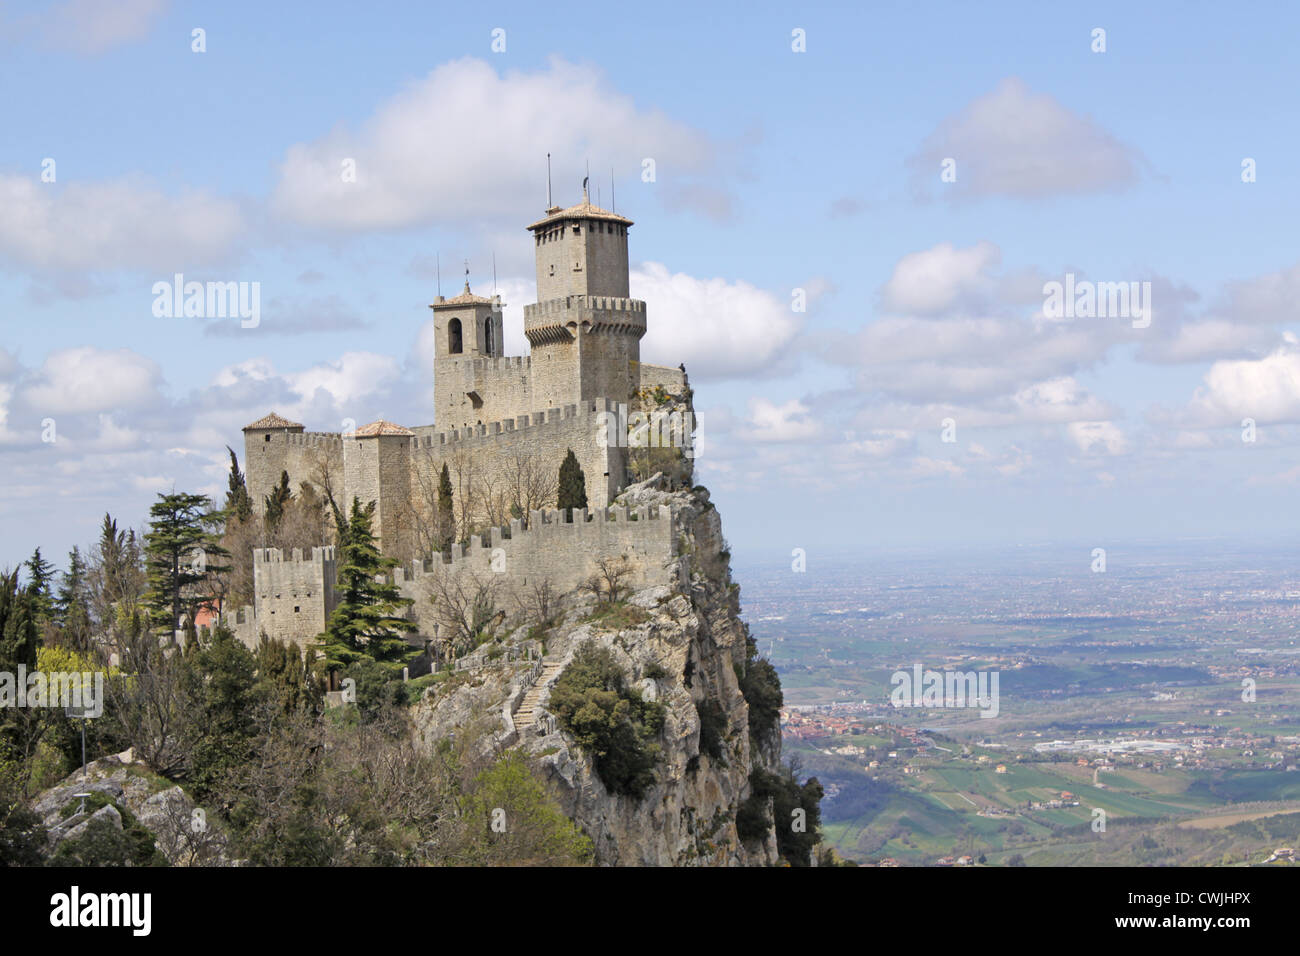 San marino Mount Titano Castle - Stock Image